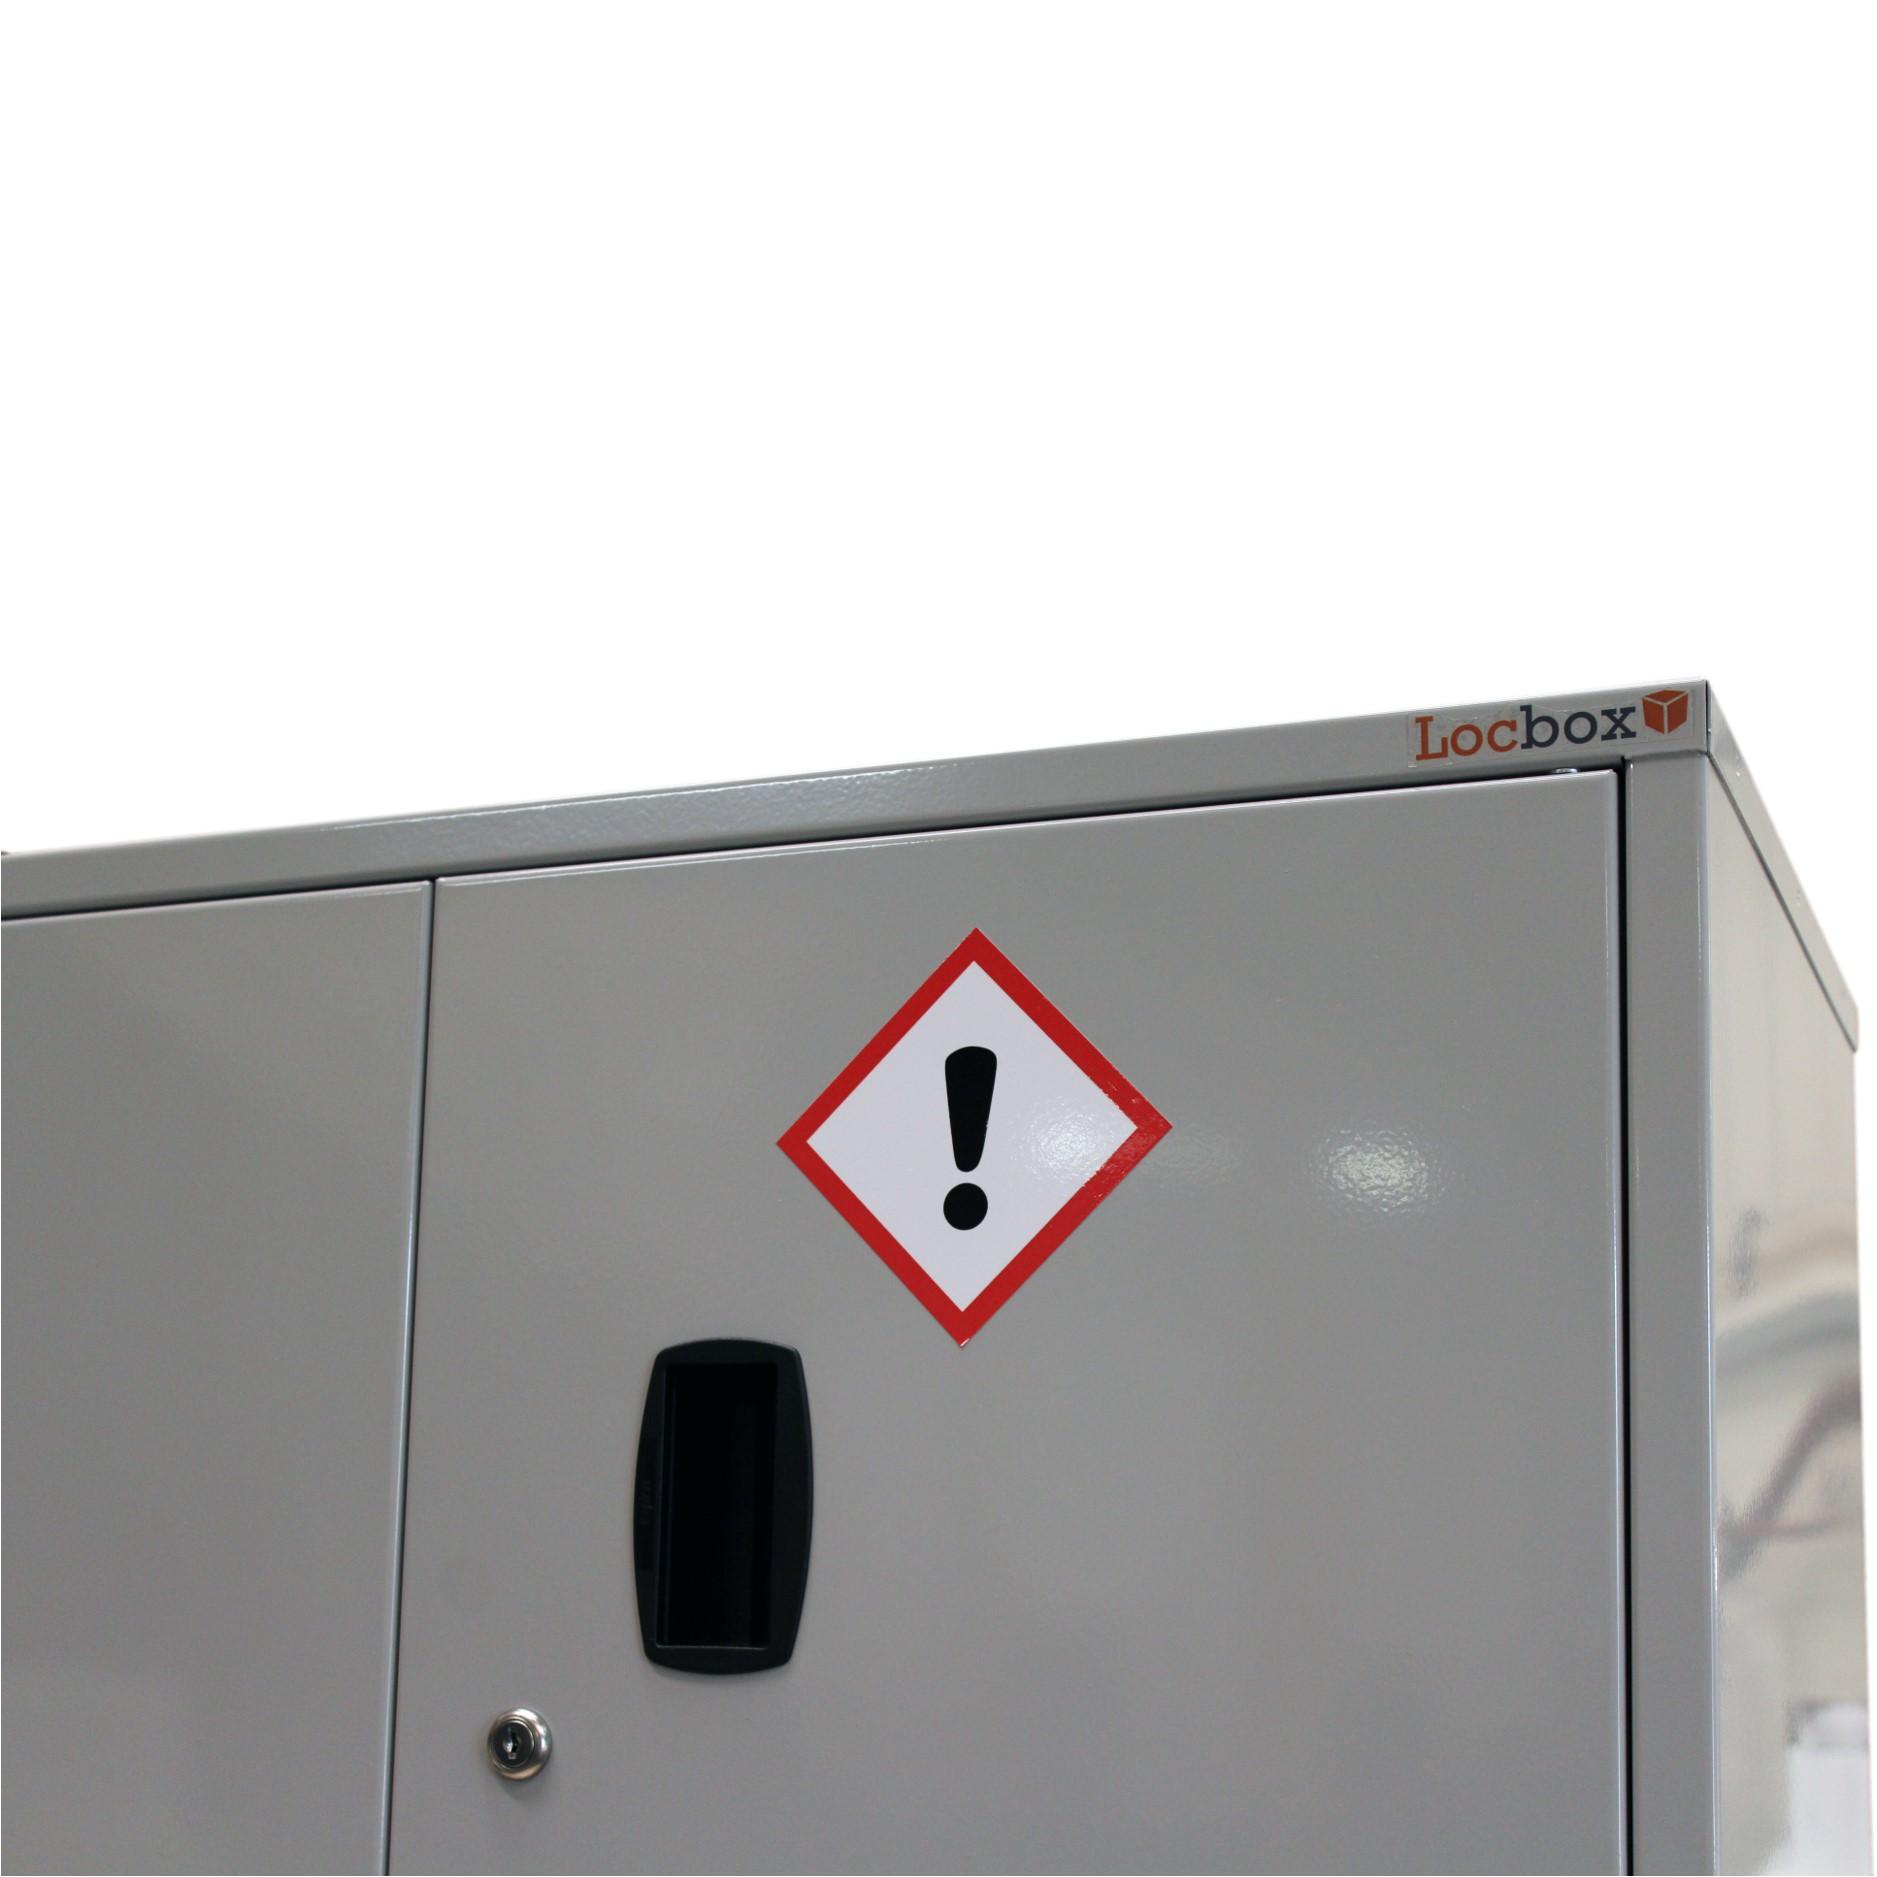 700mm D W CoSHH Cabinet H x 900mm x 460mm